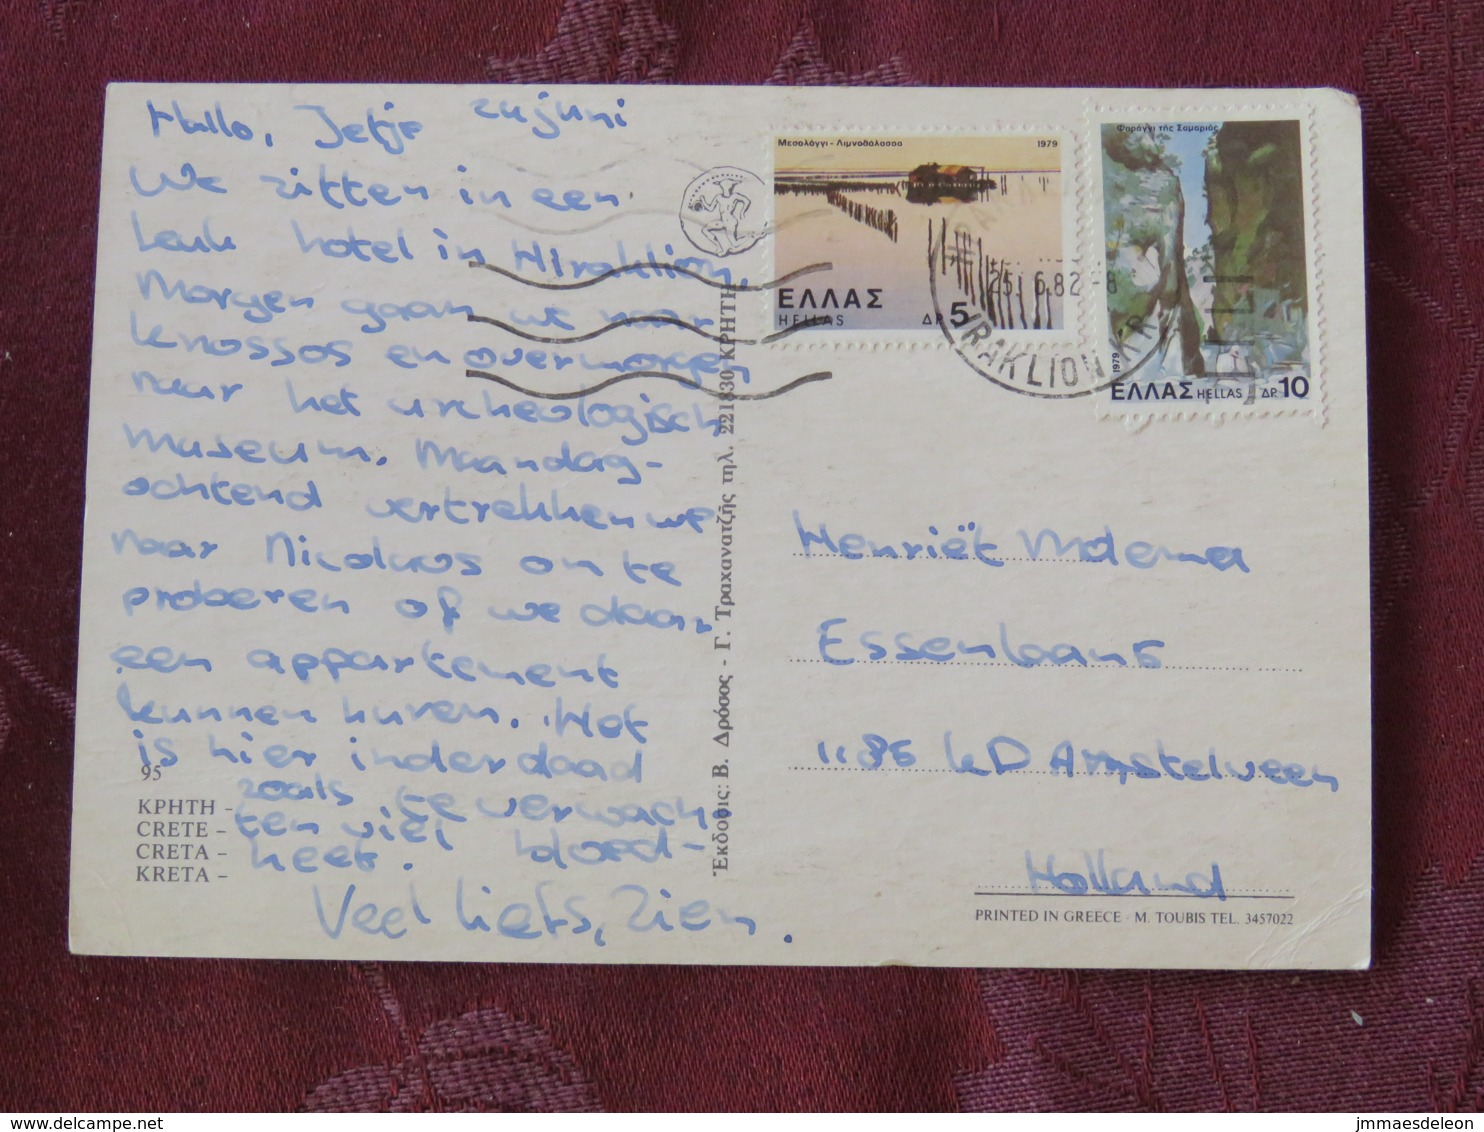 "Greece 1982 Postcard ""Crete Multiview People Handicraft"" To Holland - Missolonghi Salt Lake - Samarias Gorge - Greece"